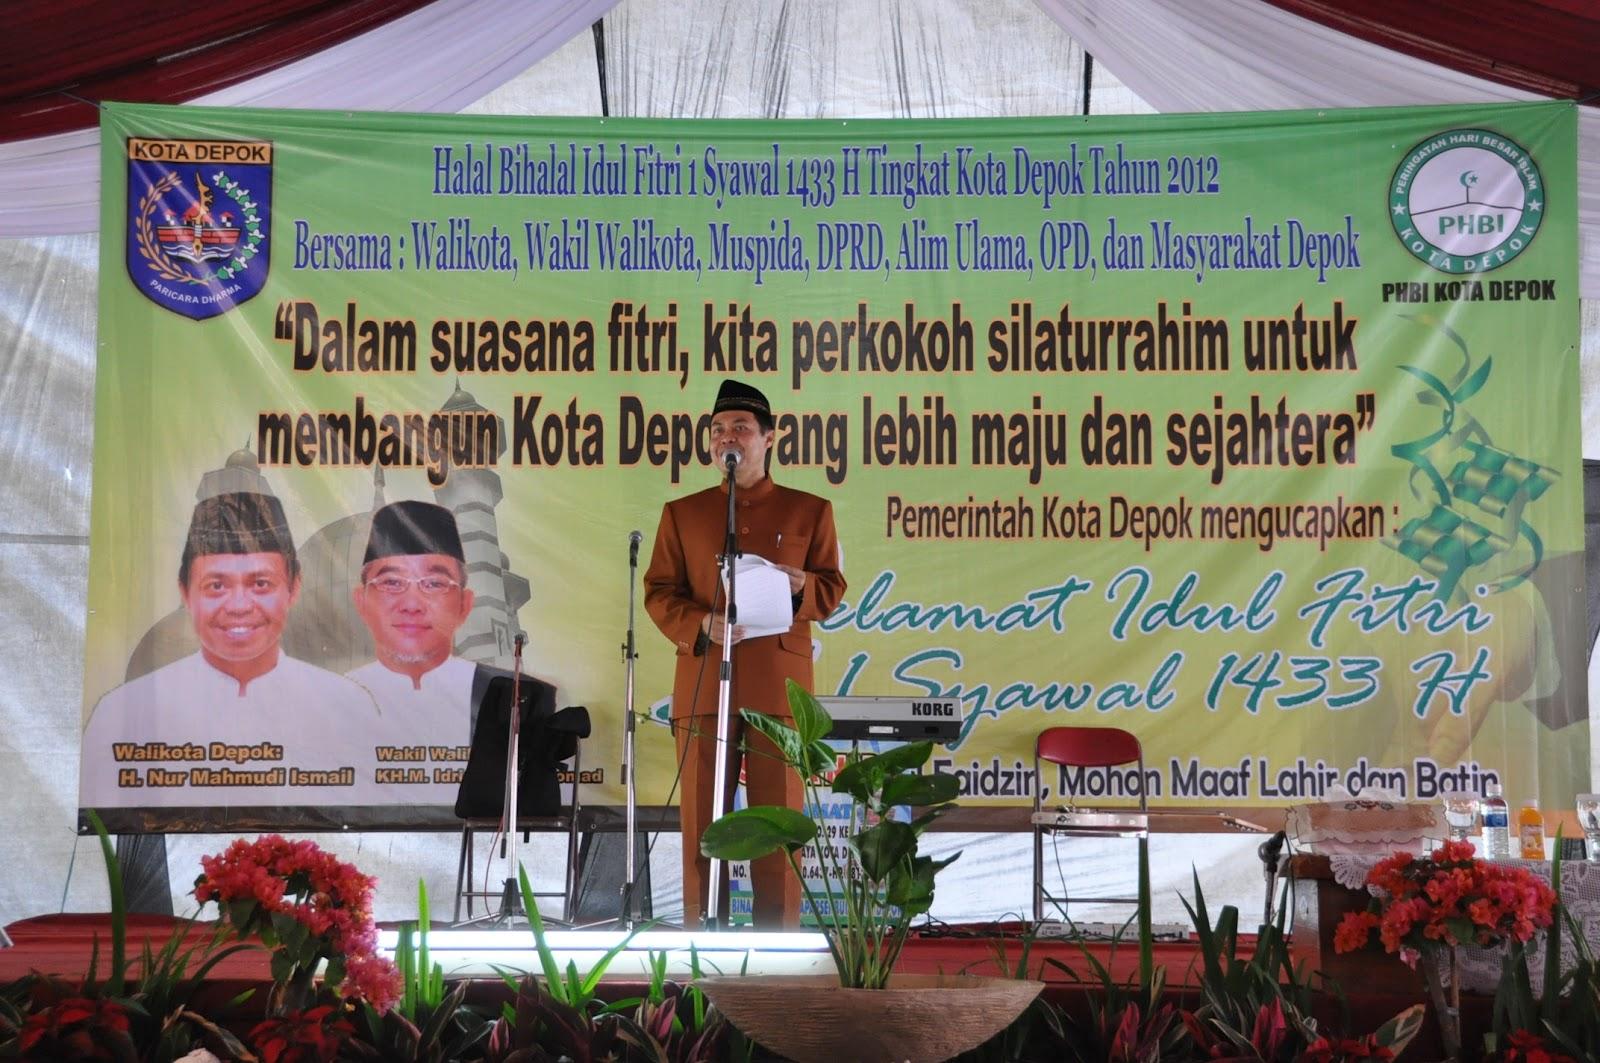 Humas Kota Depok Halal Bihalal Idul Fitri 1 Syawal 1433 H Tingkat